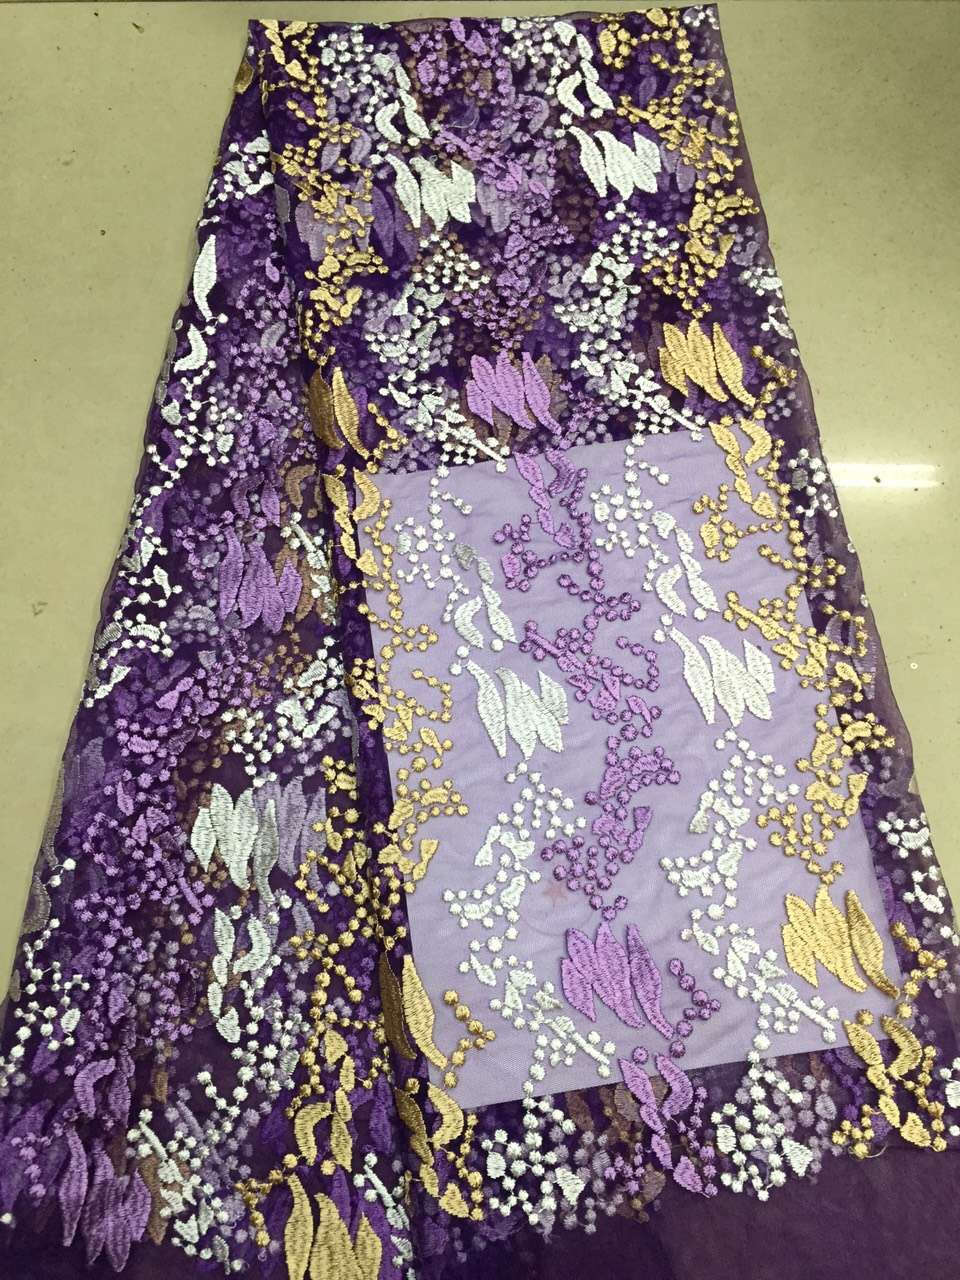 Achetez en gros sari tissu en ligne des grossistes sari tissu chinois ali - Vente de tissus en ligne suisse ...